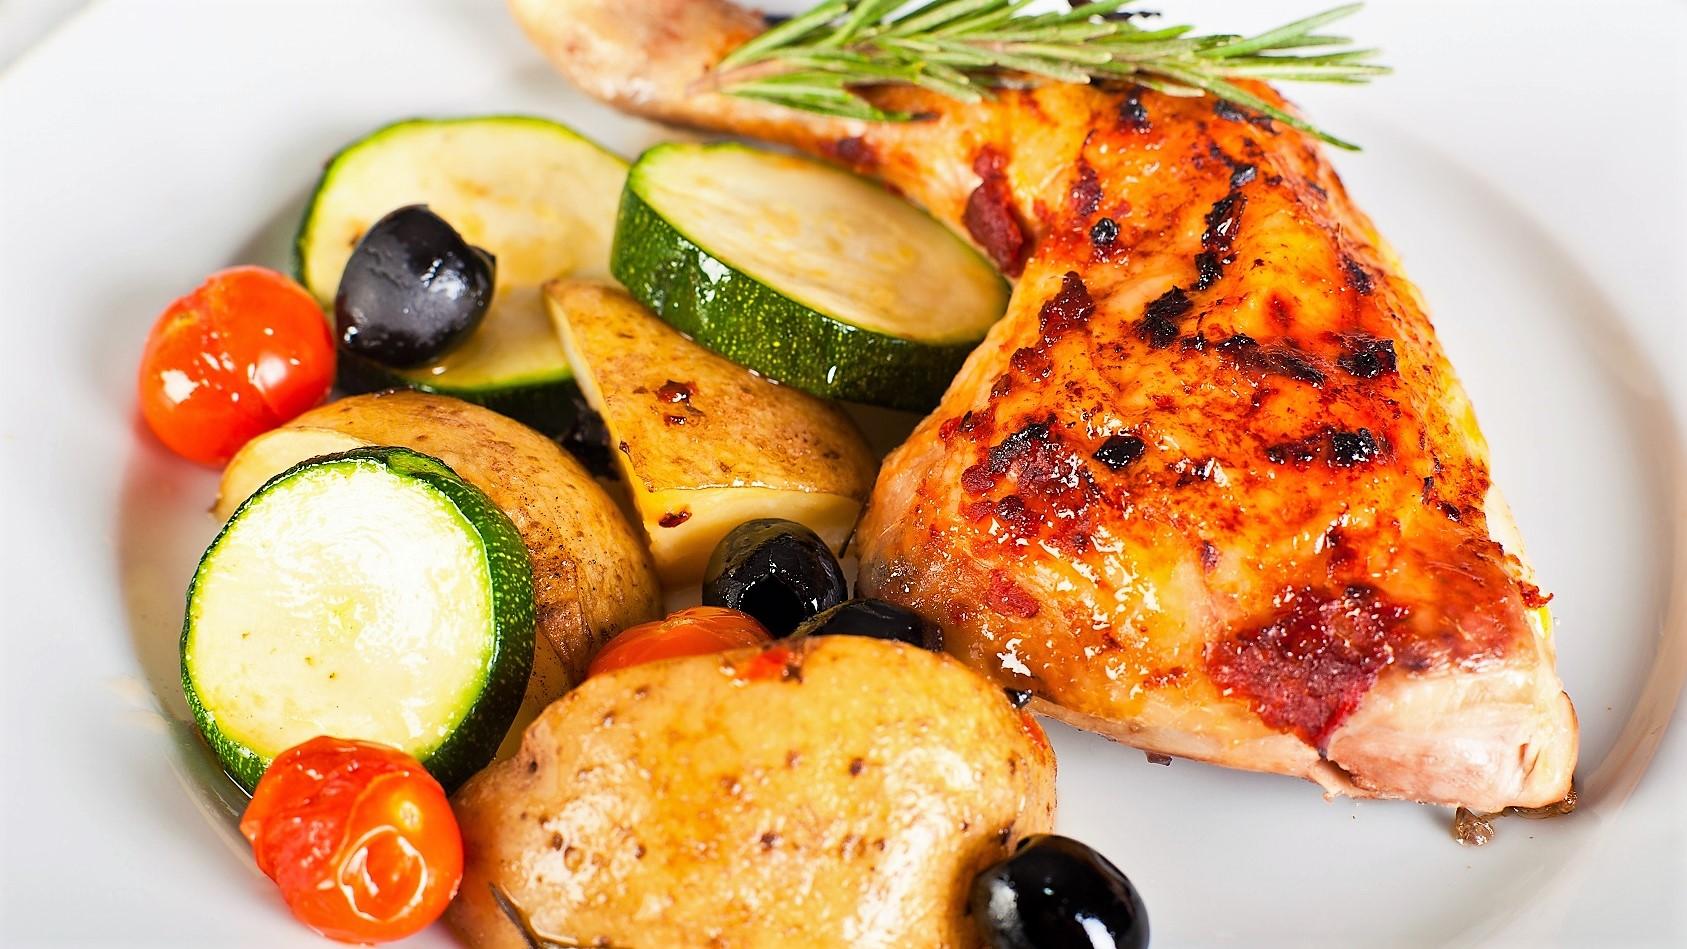 Healthy Cooking Veronica's Healthy Living